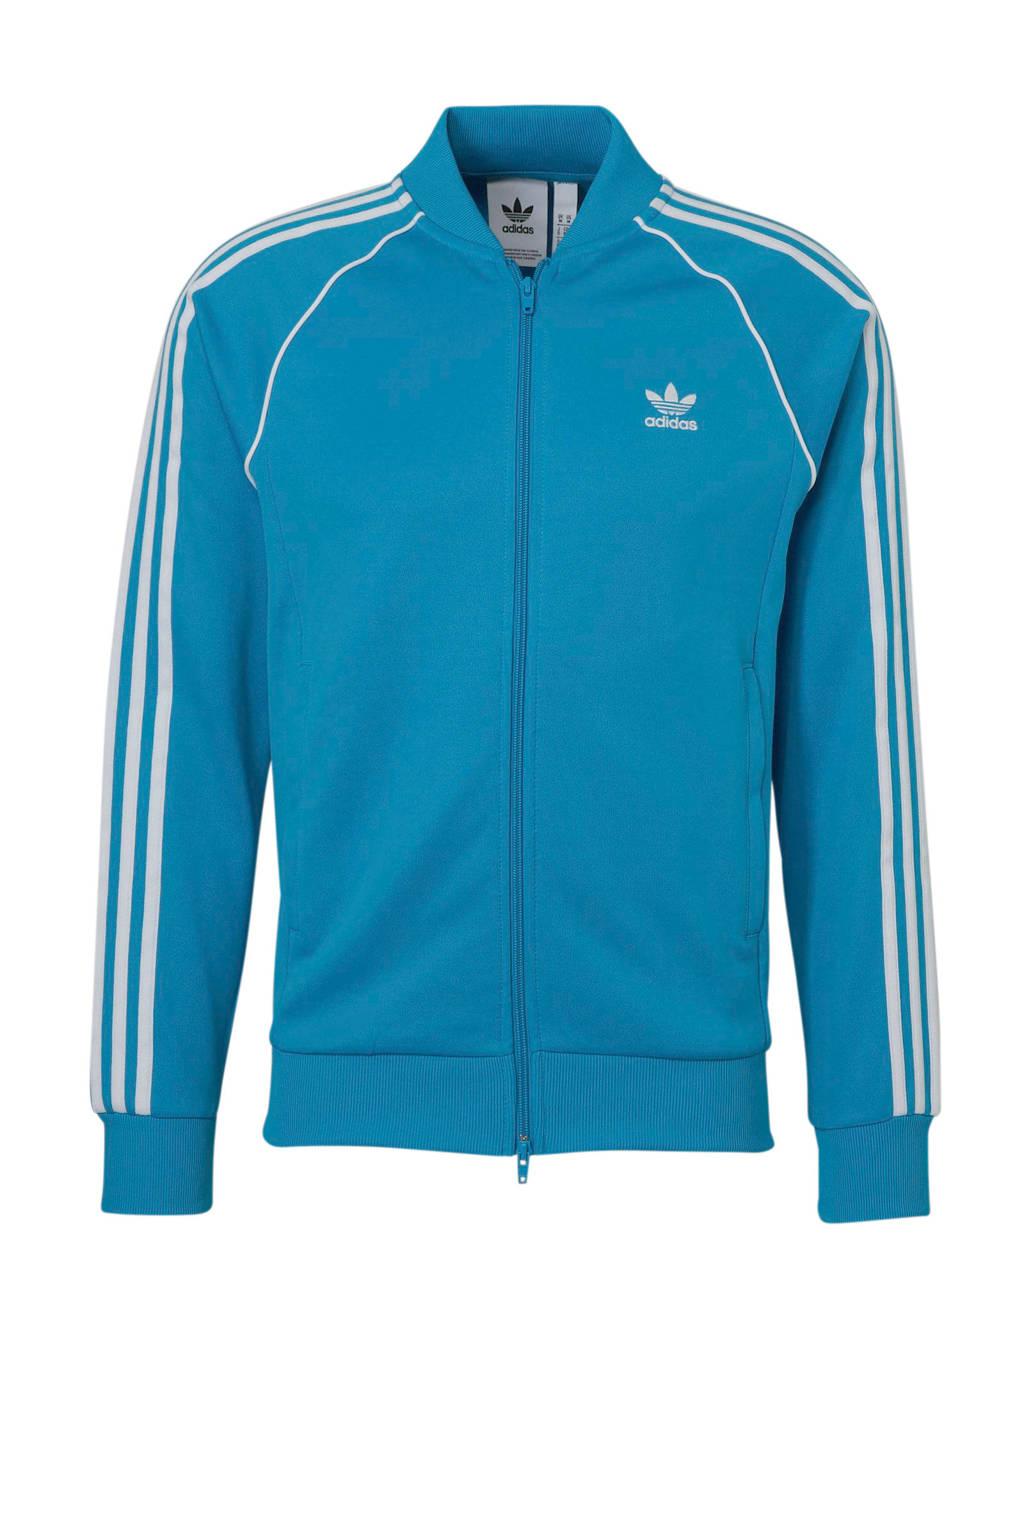 462c1581167 adidas originals vest blauw/wit, Blauw/wit